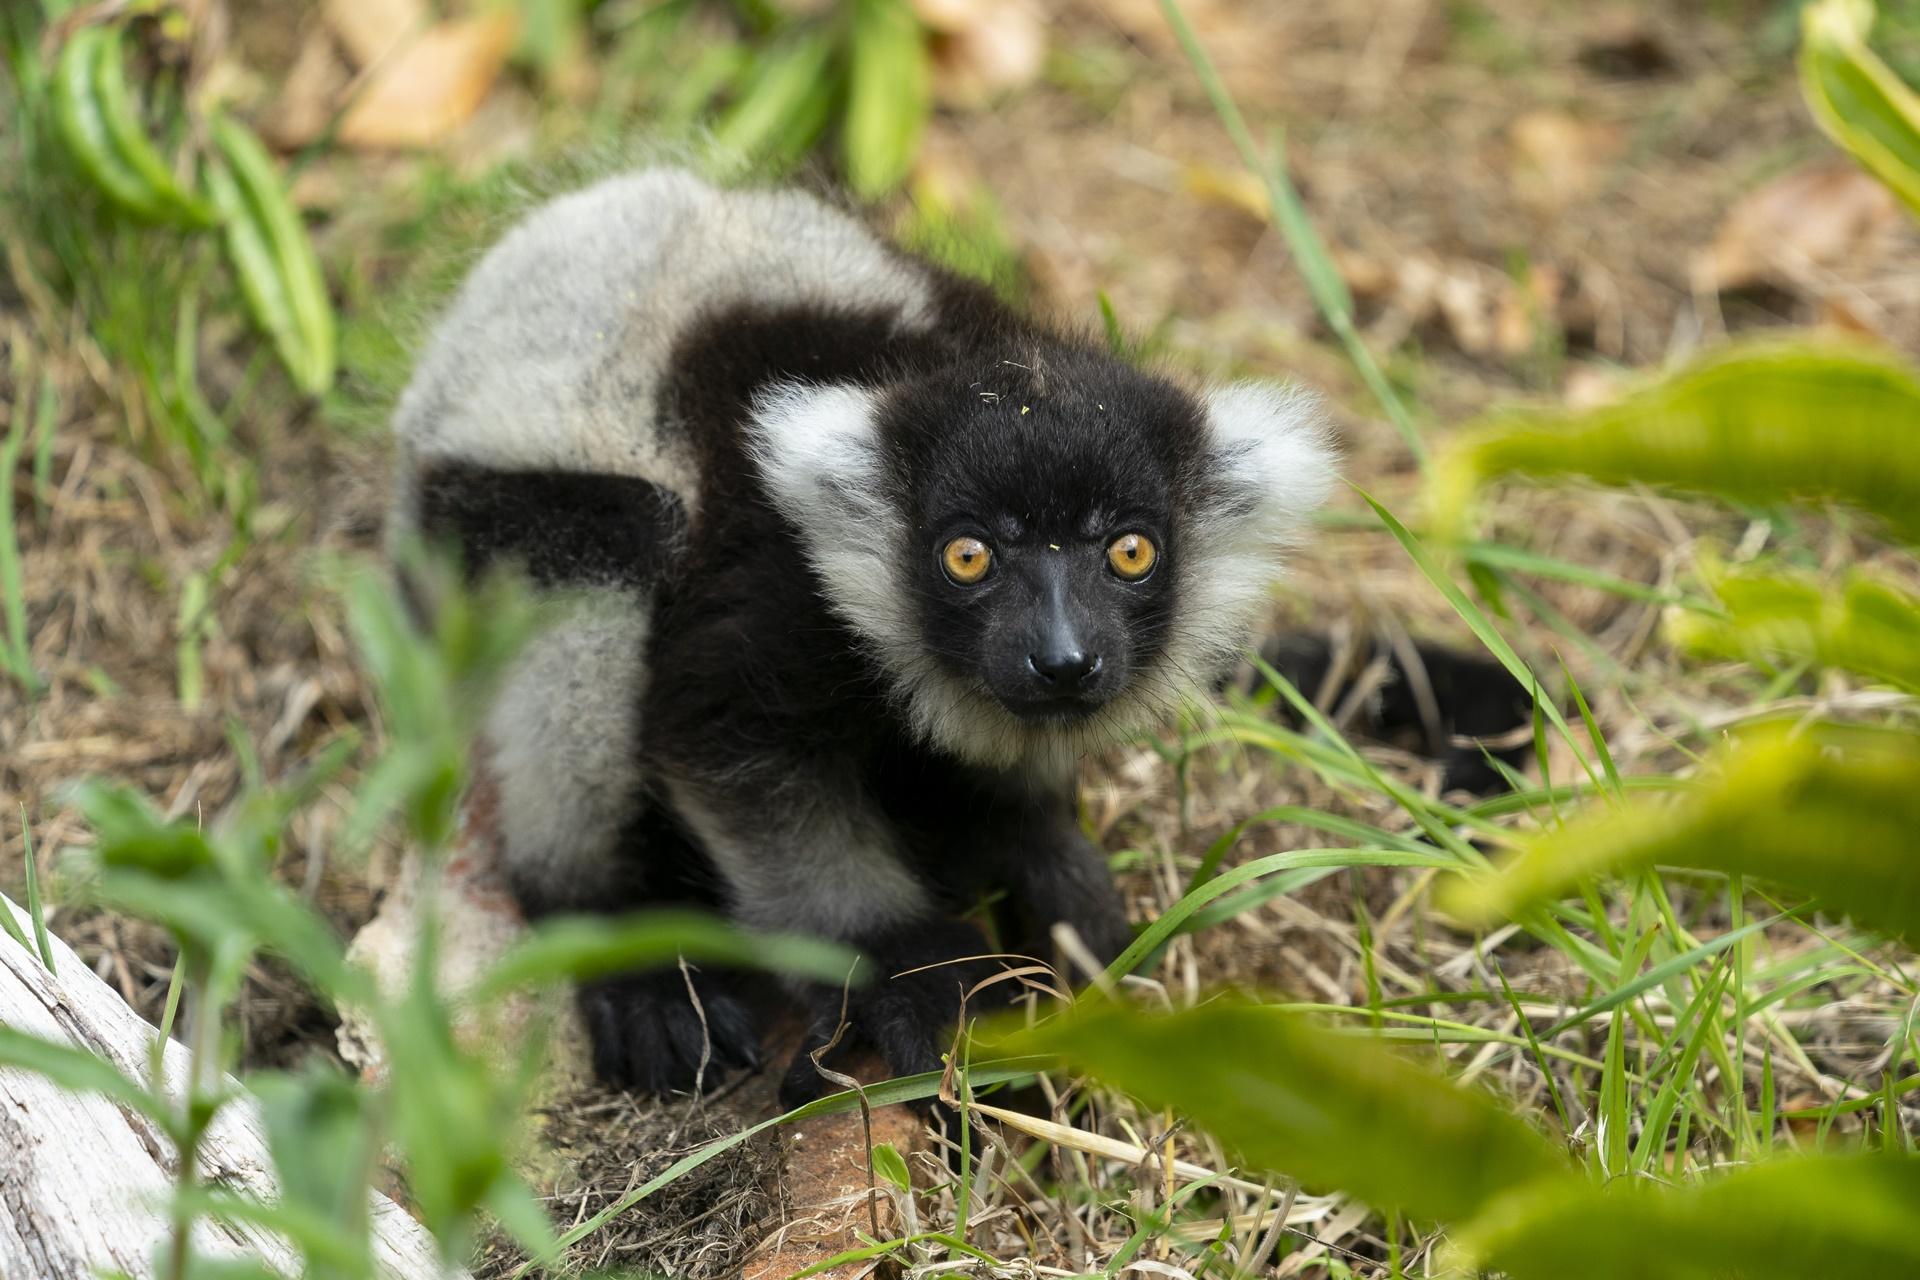 Black-and-white-ruffed-lemur-